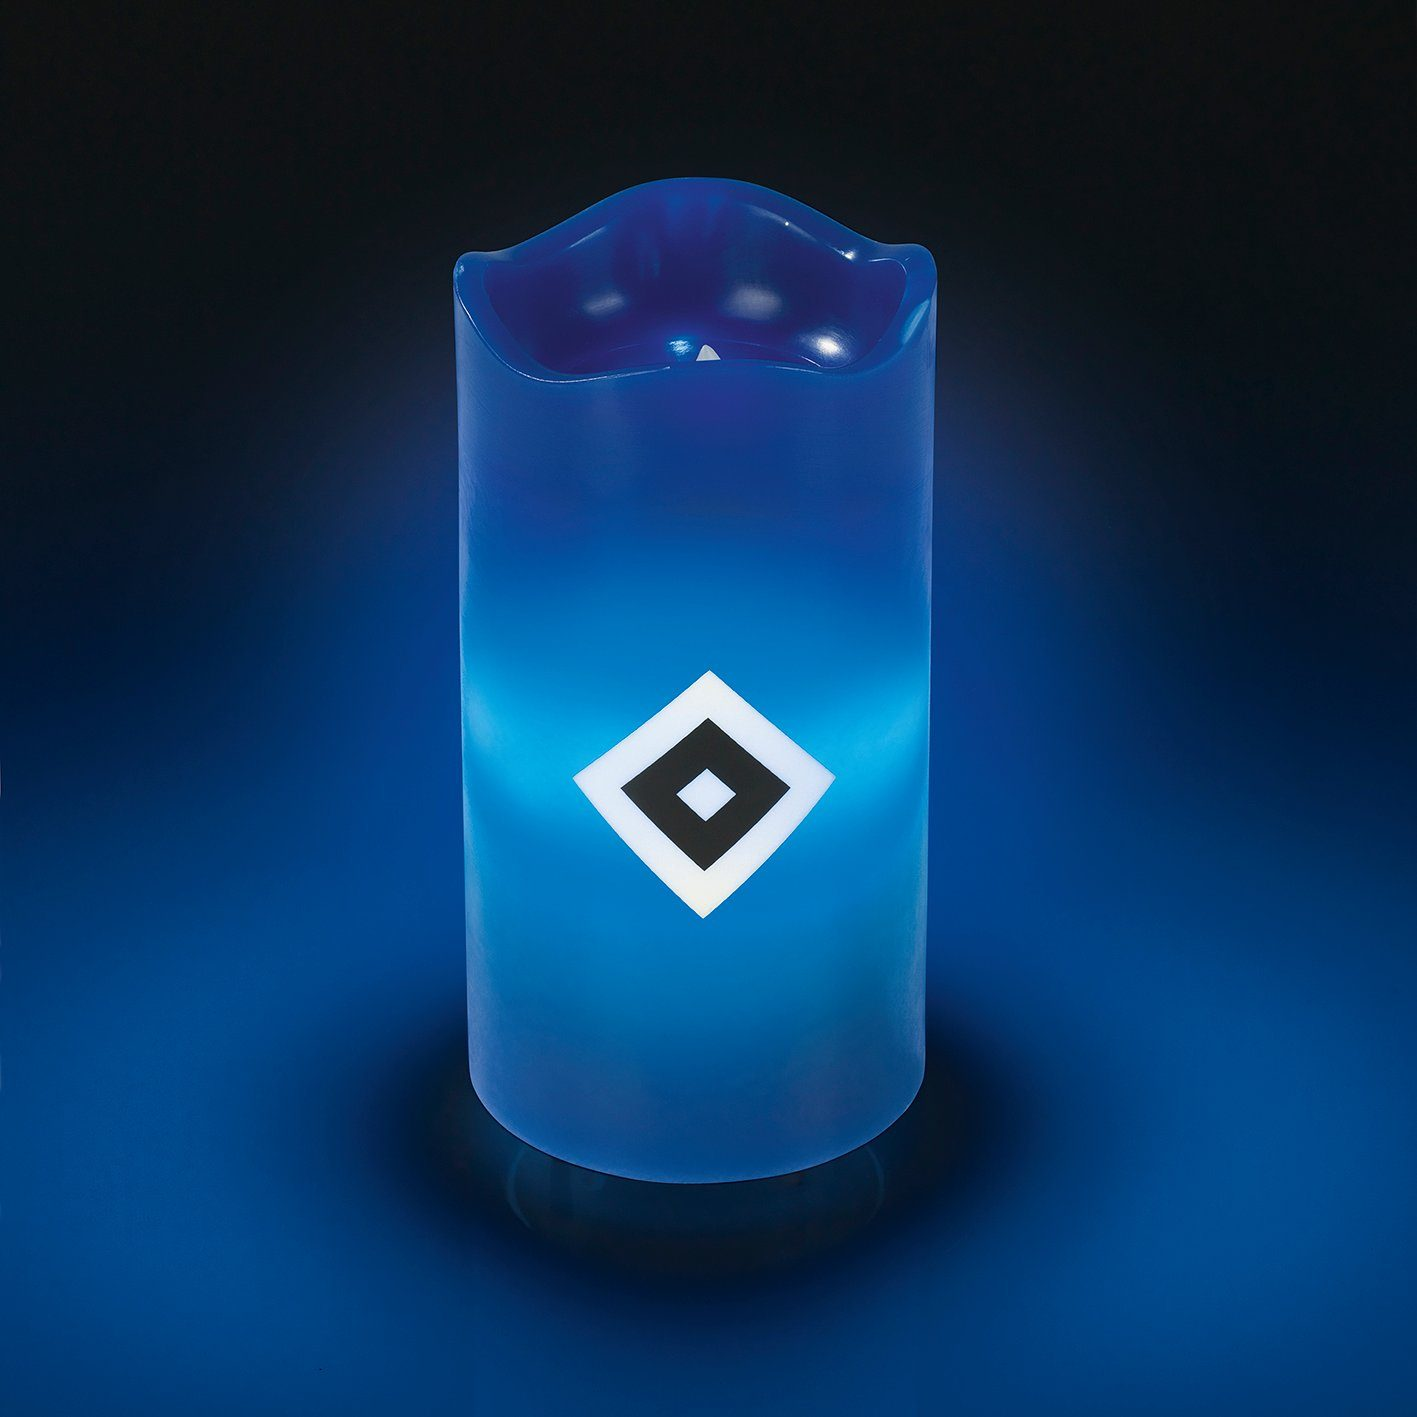 Scheibe blaues Quadrat kompatibel mit Charlotte 21 edles Touch /& RD